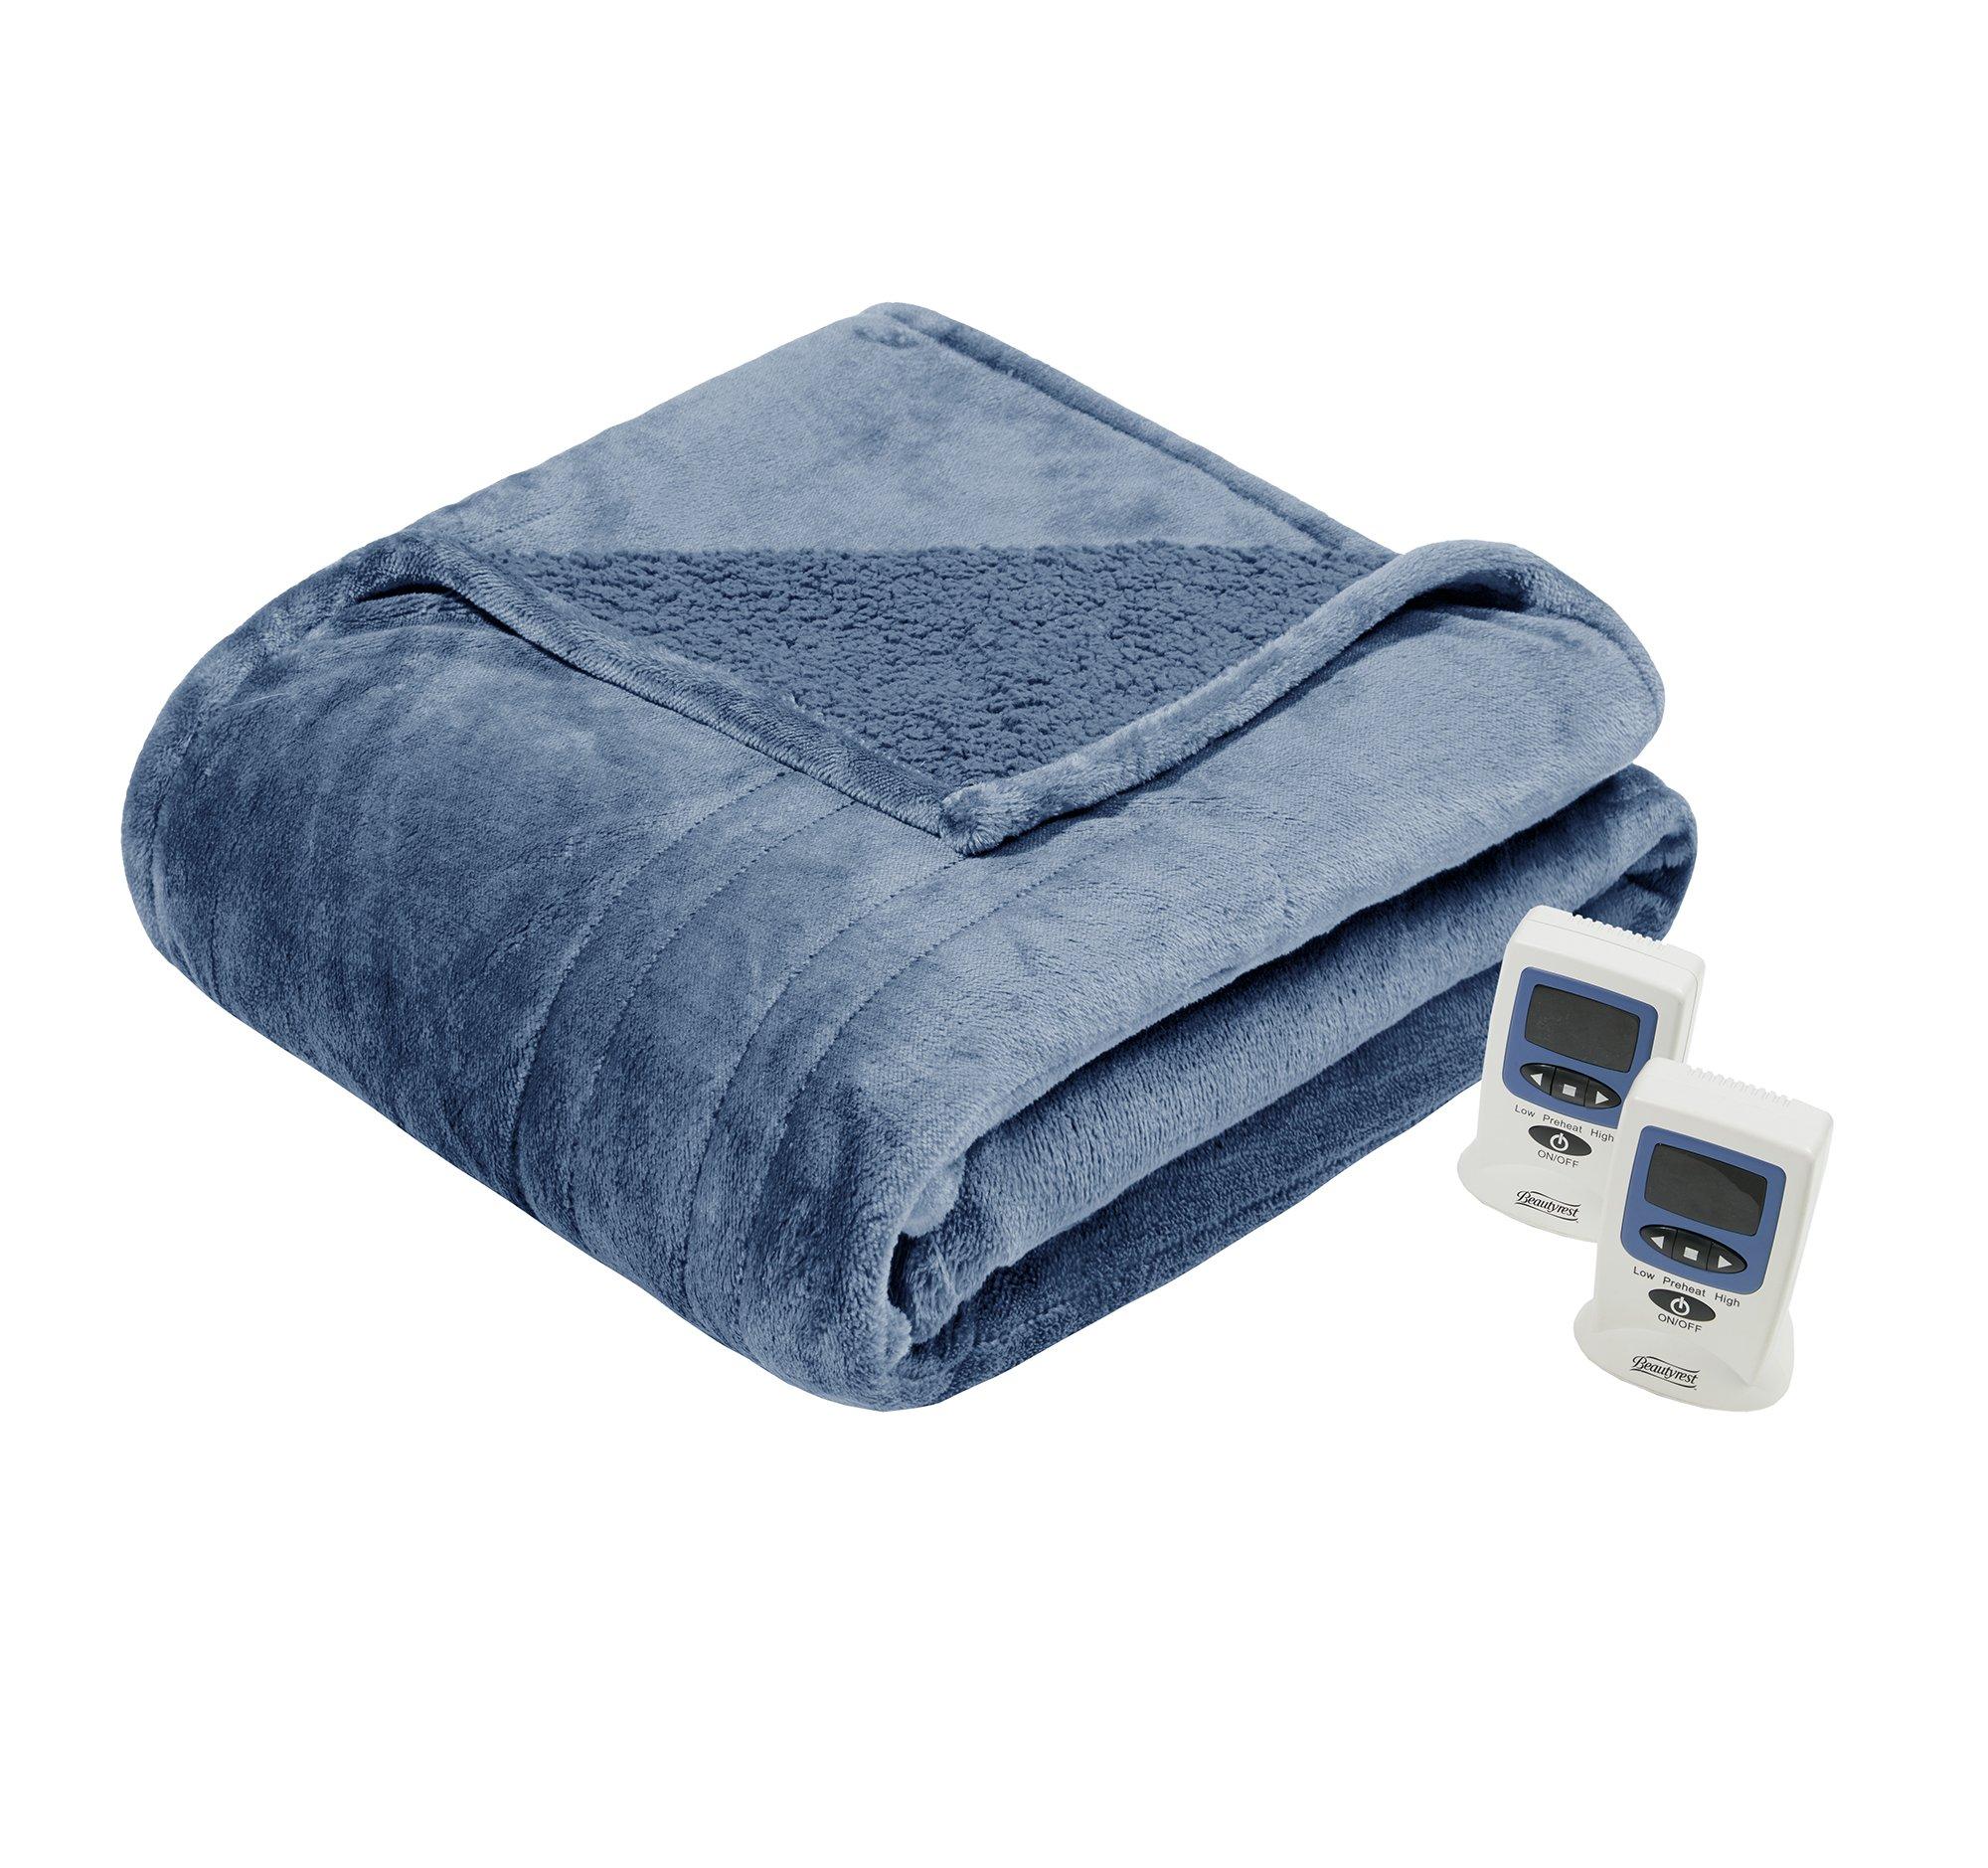 Beautyrest Solid Microlight/Berber Heated Blanket, Full, Sapphire